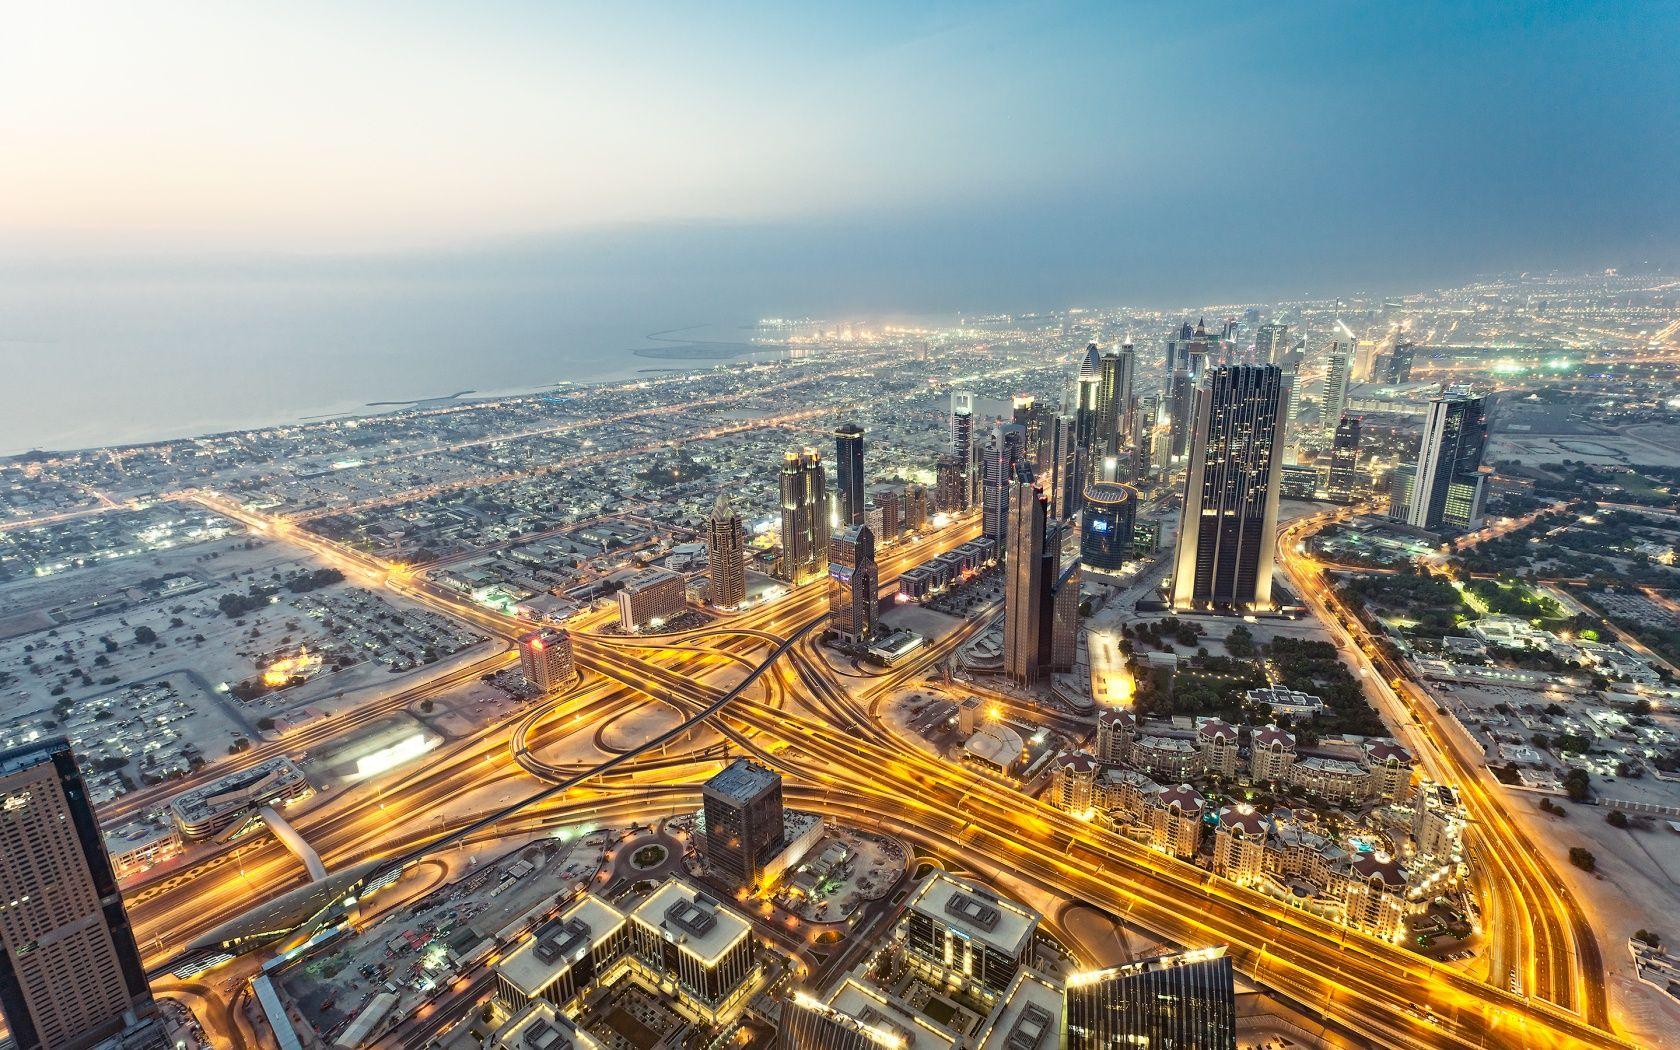 Download High Quality Bike Full Hd Wallpaper In Widescreen: Download HD Burj Khalifa Dubai Eagle Eye View Wallpapers